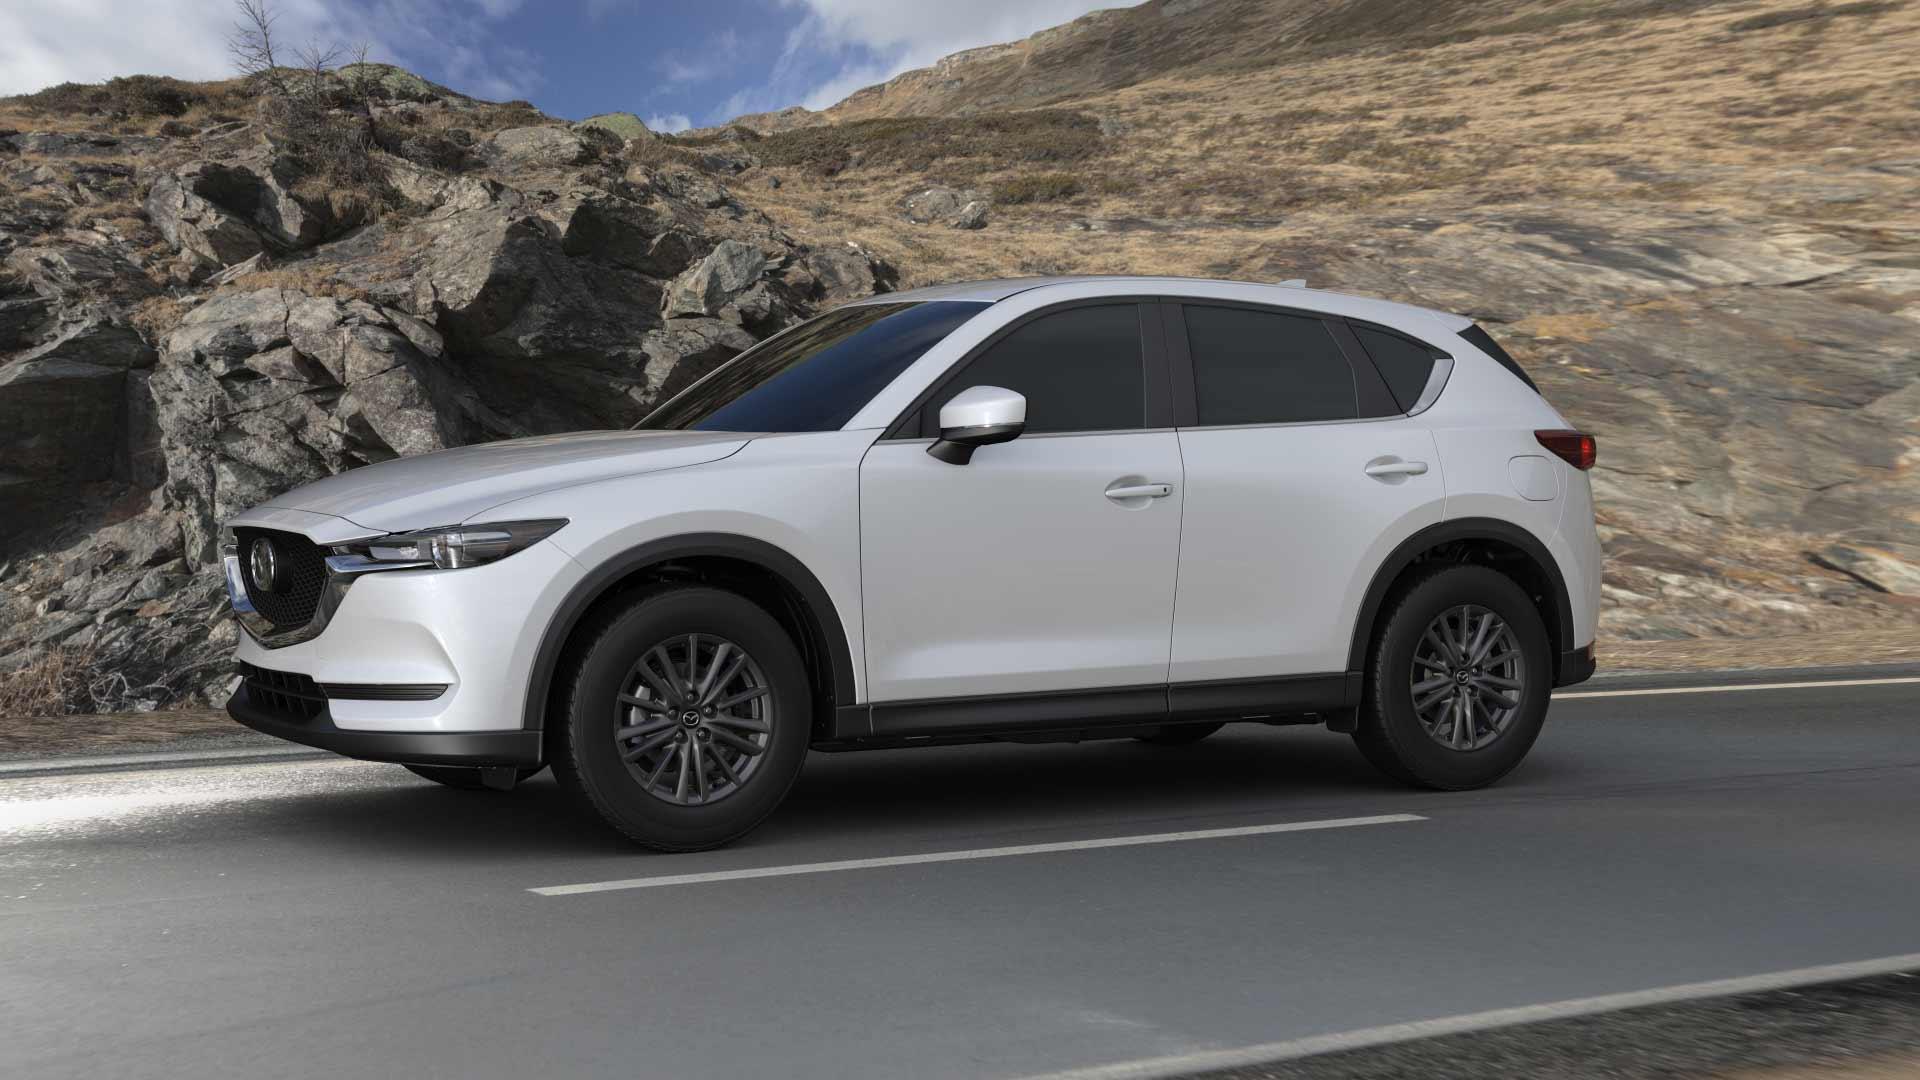 Kelebihan Mazda Cx 5 2013 Harga